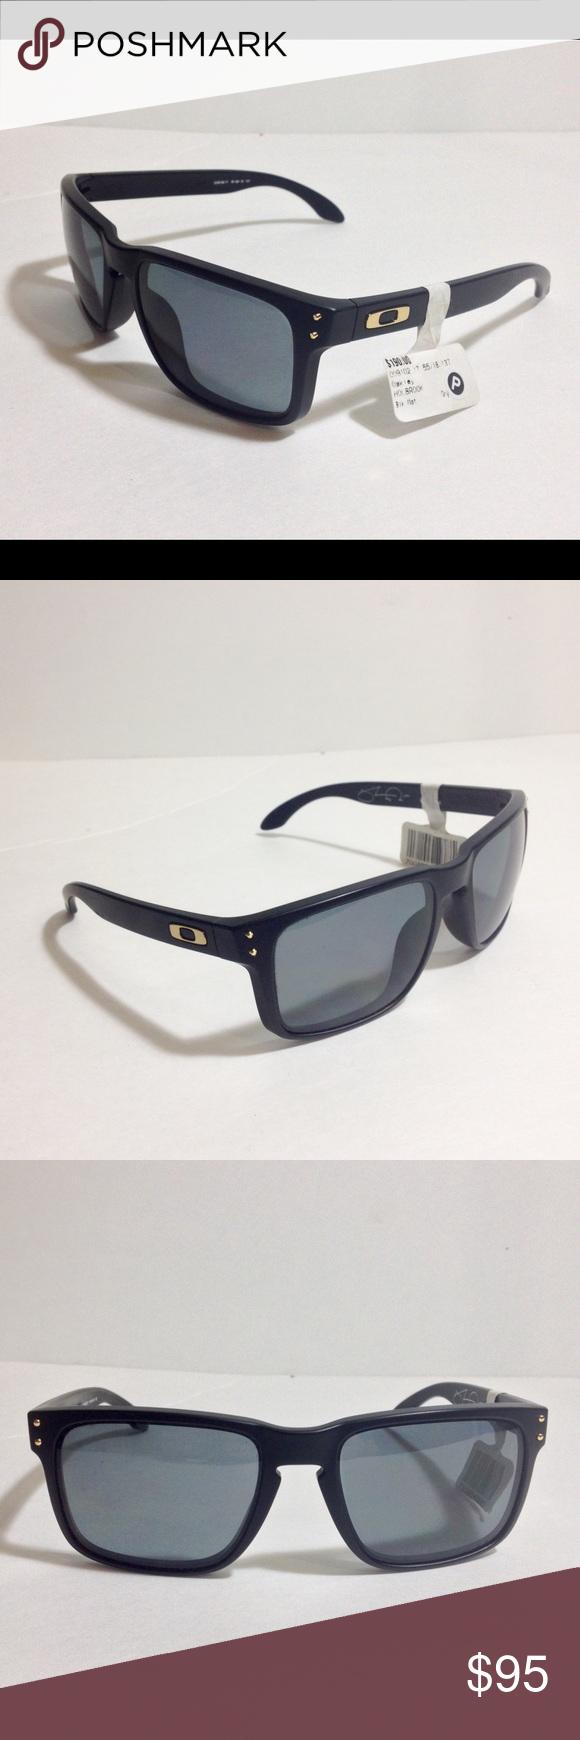 Oakley Holbrook Shaun White Polarized Sunglasses Boutique